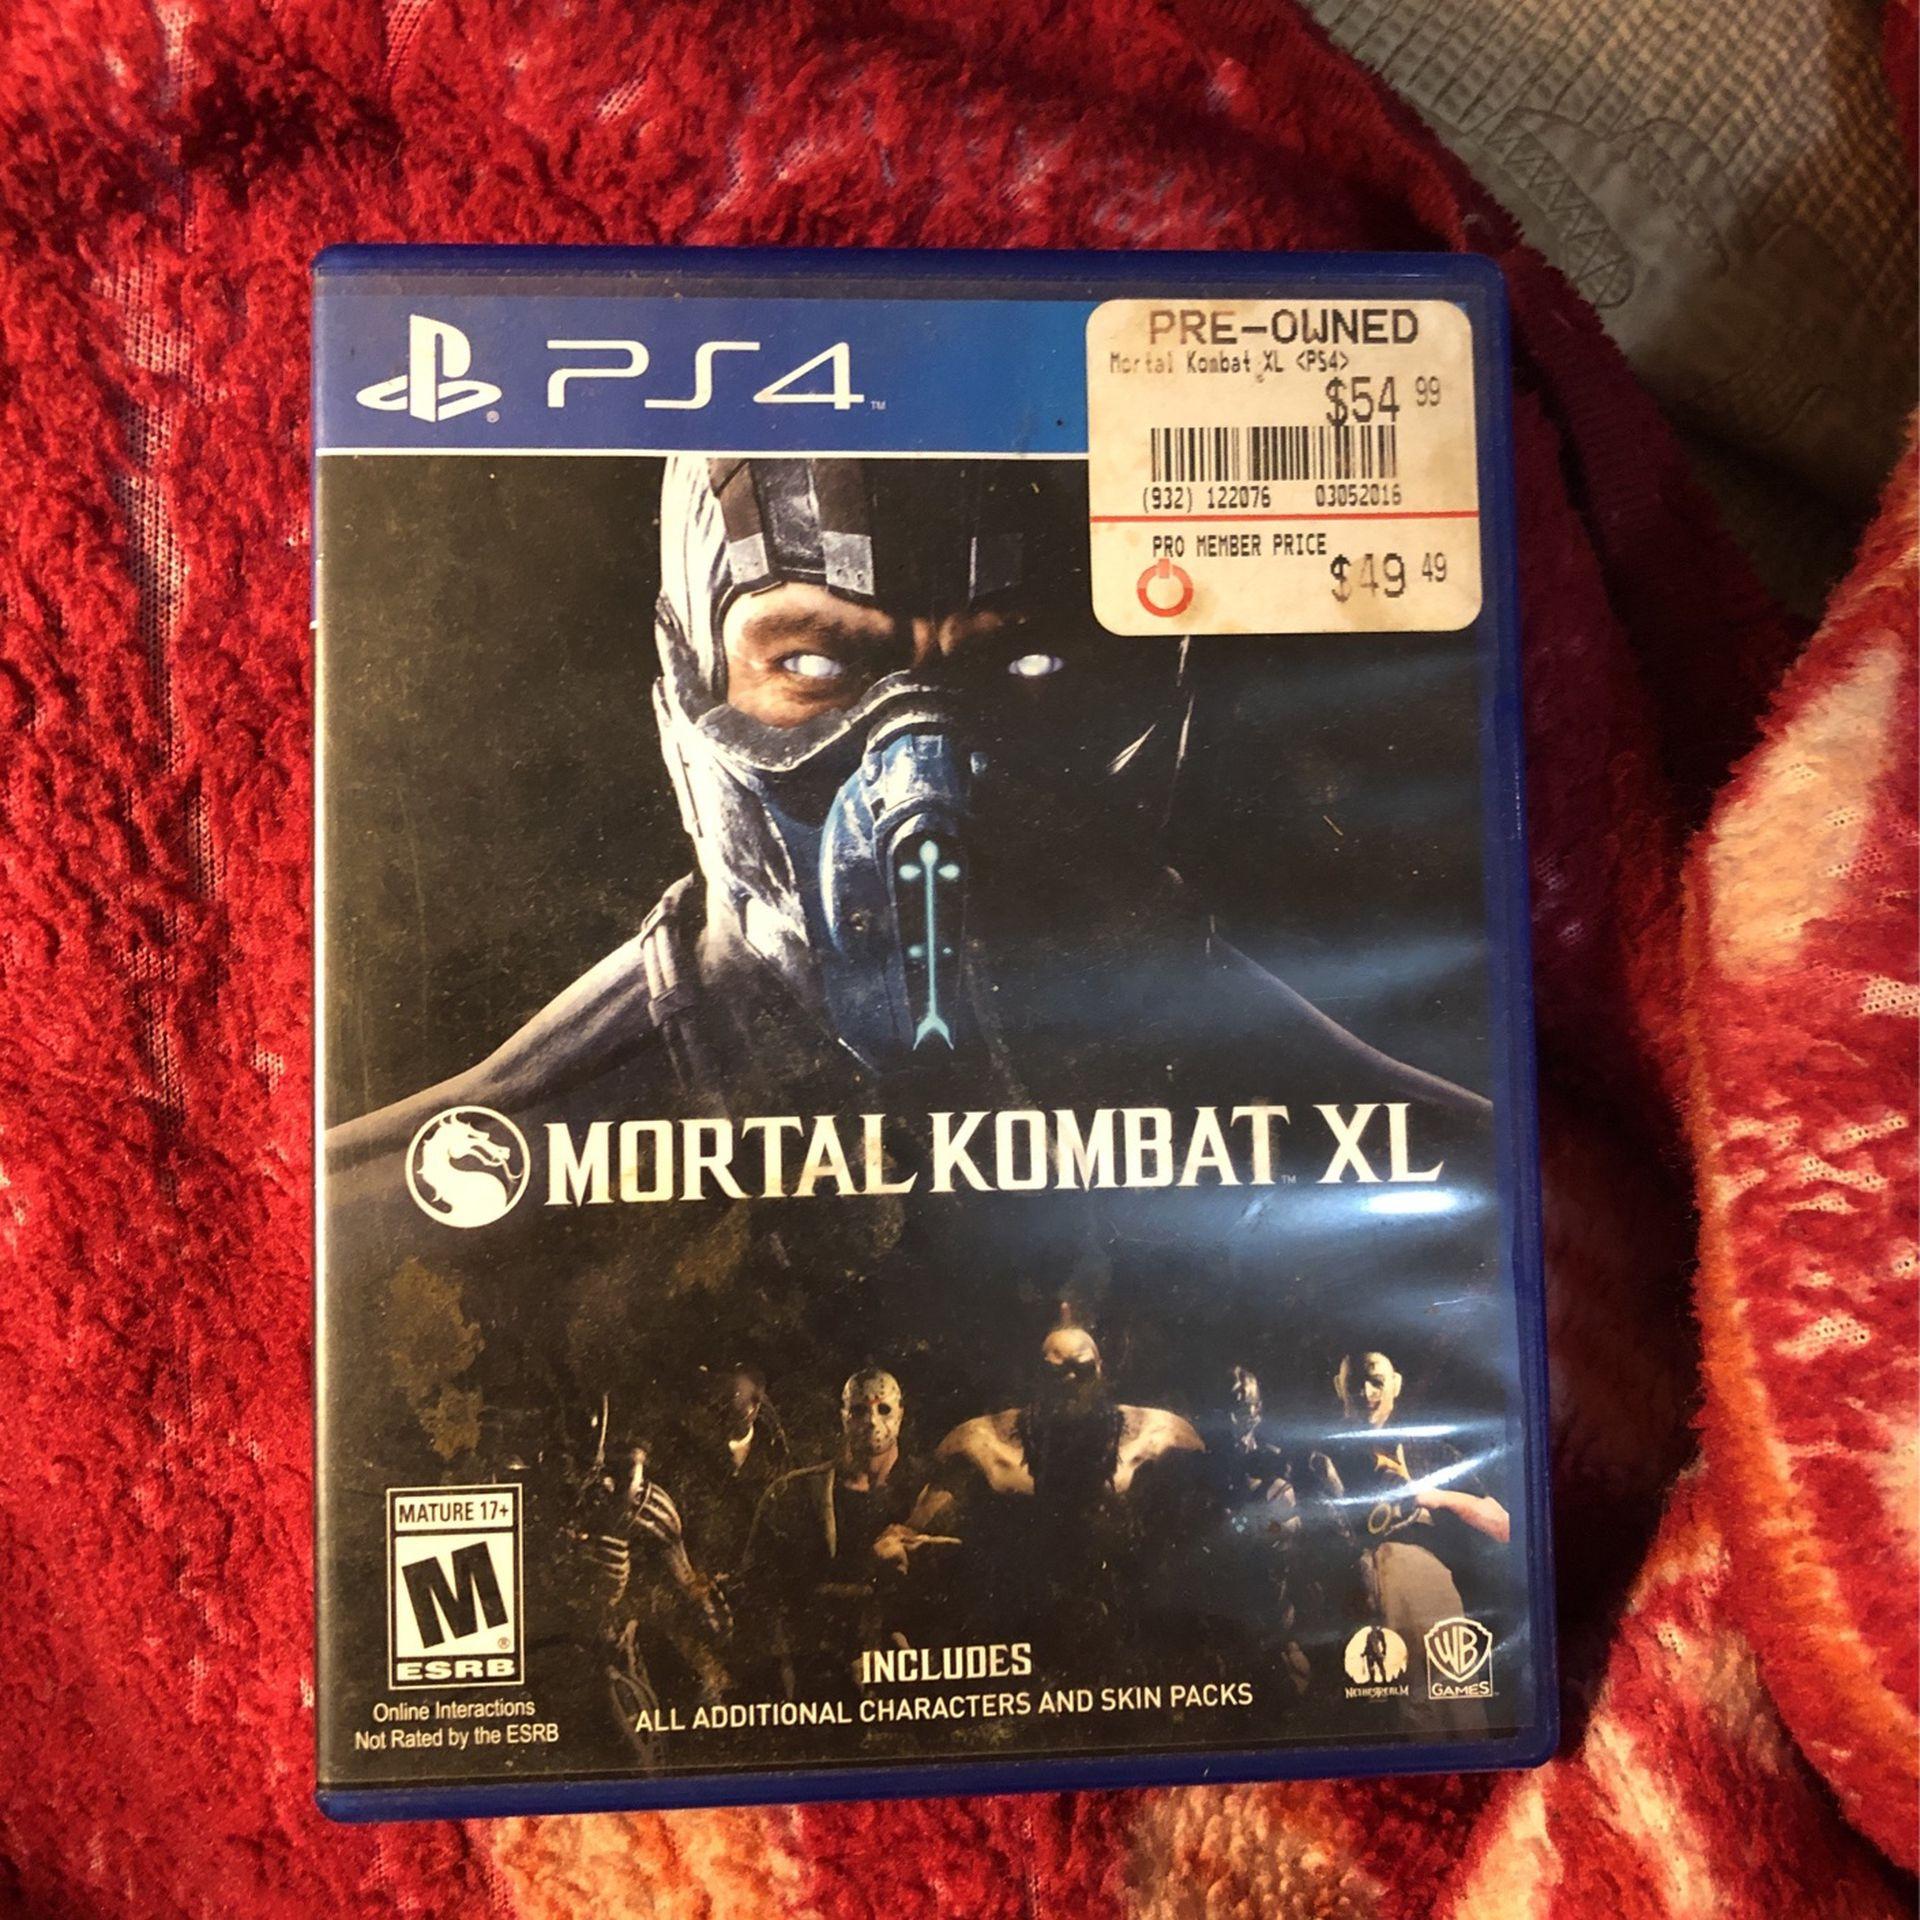 mortal kombat XL ps4 (all characters unlocked)